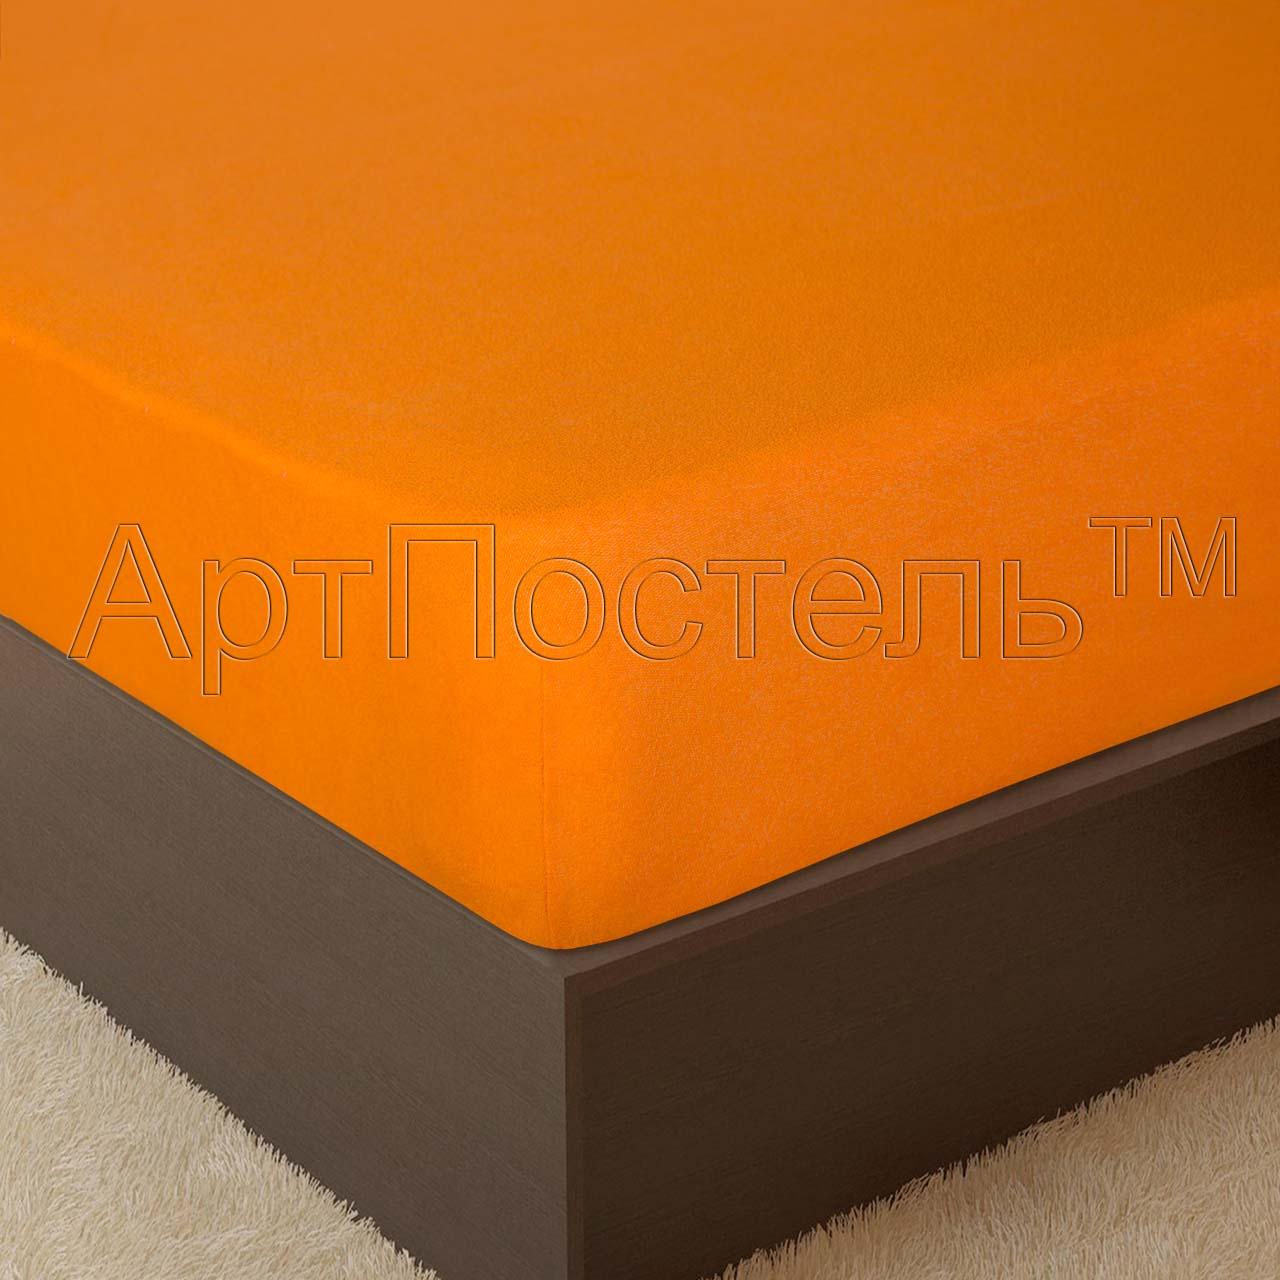 Простыня Апельсин р. 180х200Простыни<br>Плотность:160 г/кв. м<br>Высота матраса:20 см<br><br>Тип: Простыня<br>Размер: 180х200<br>Материал: Махра